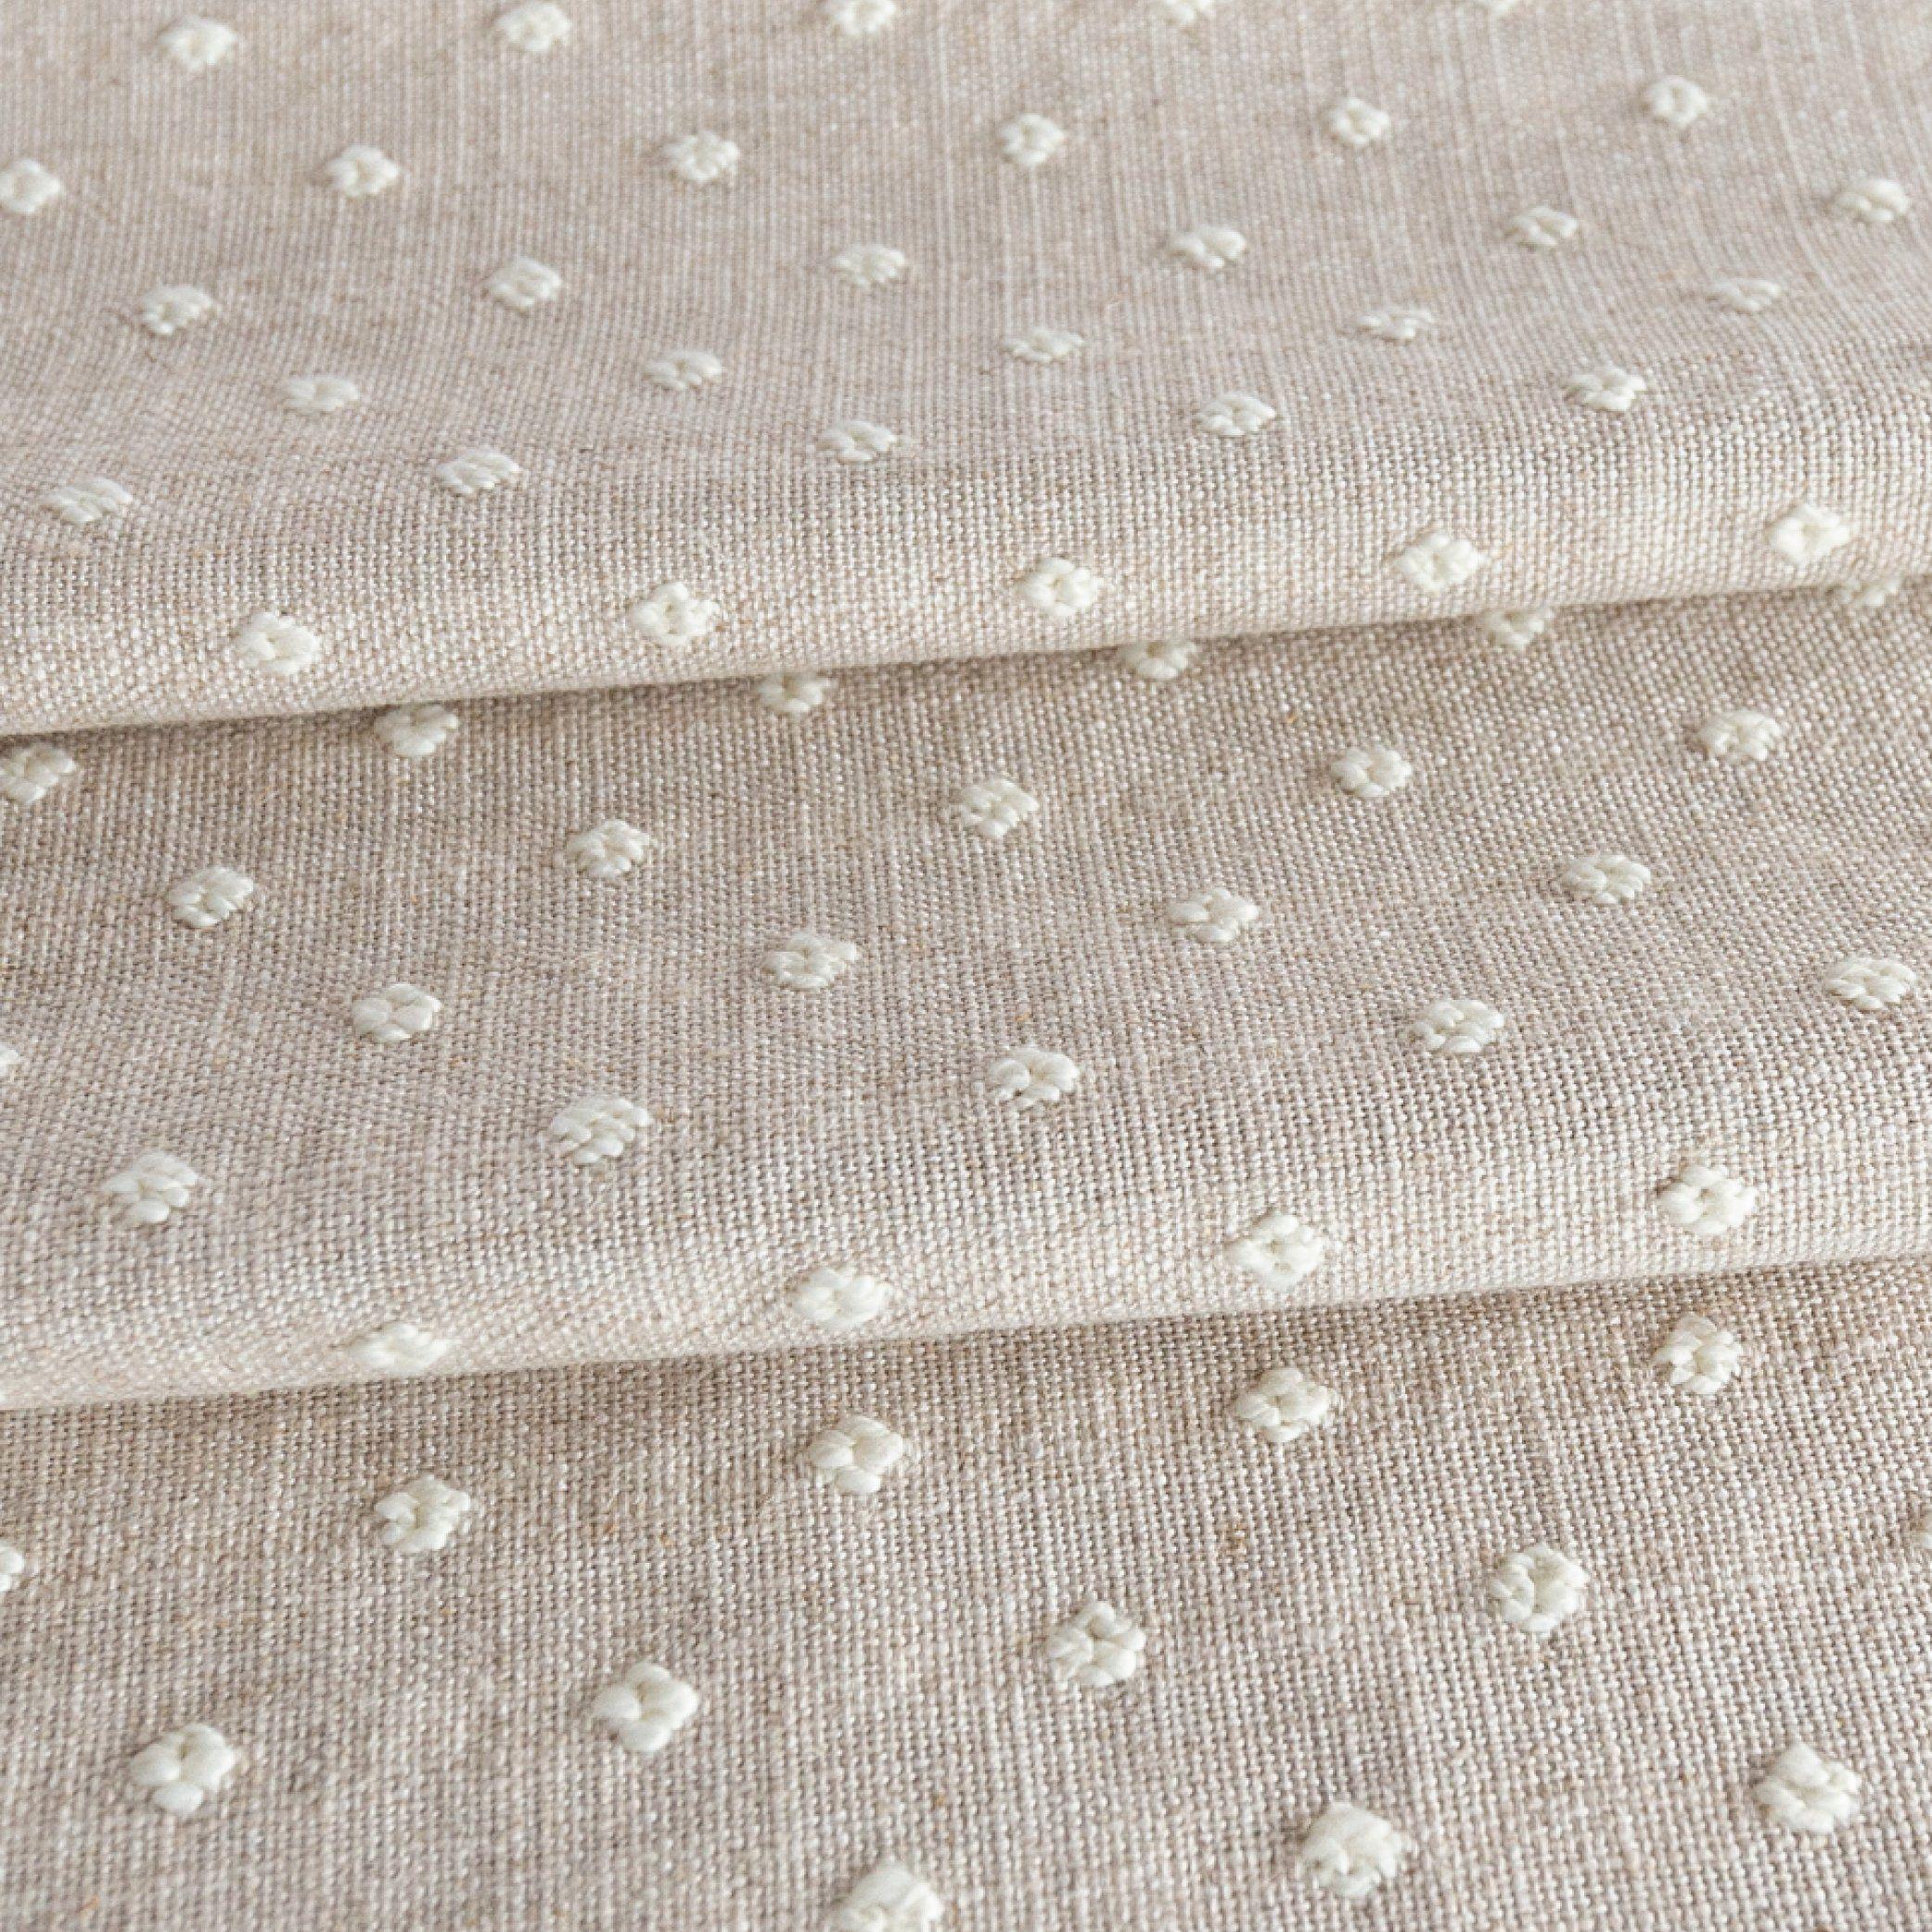 Mila Dot Fabric Flax Tonic Living Curtain Fabric Patterns Fabric Decor Coastal Fabric